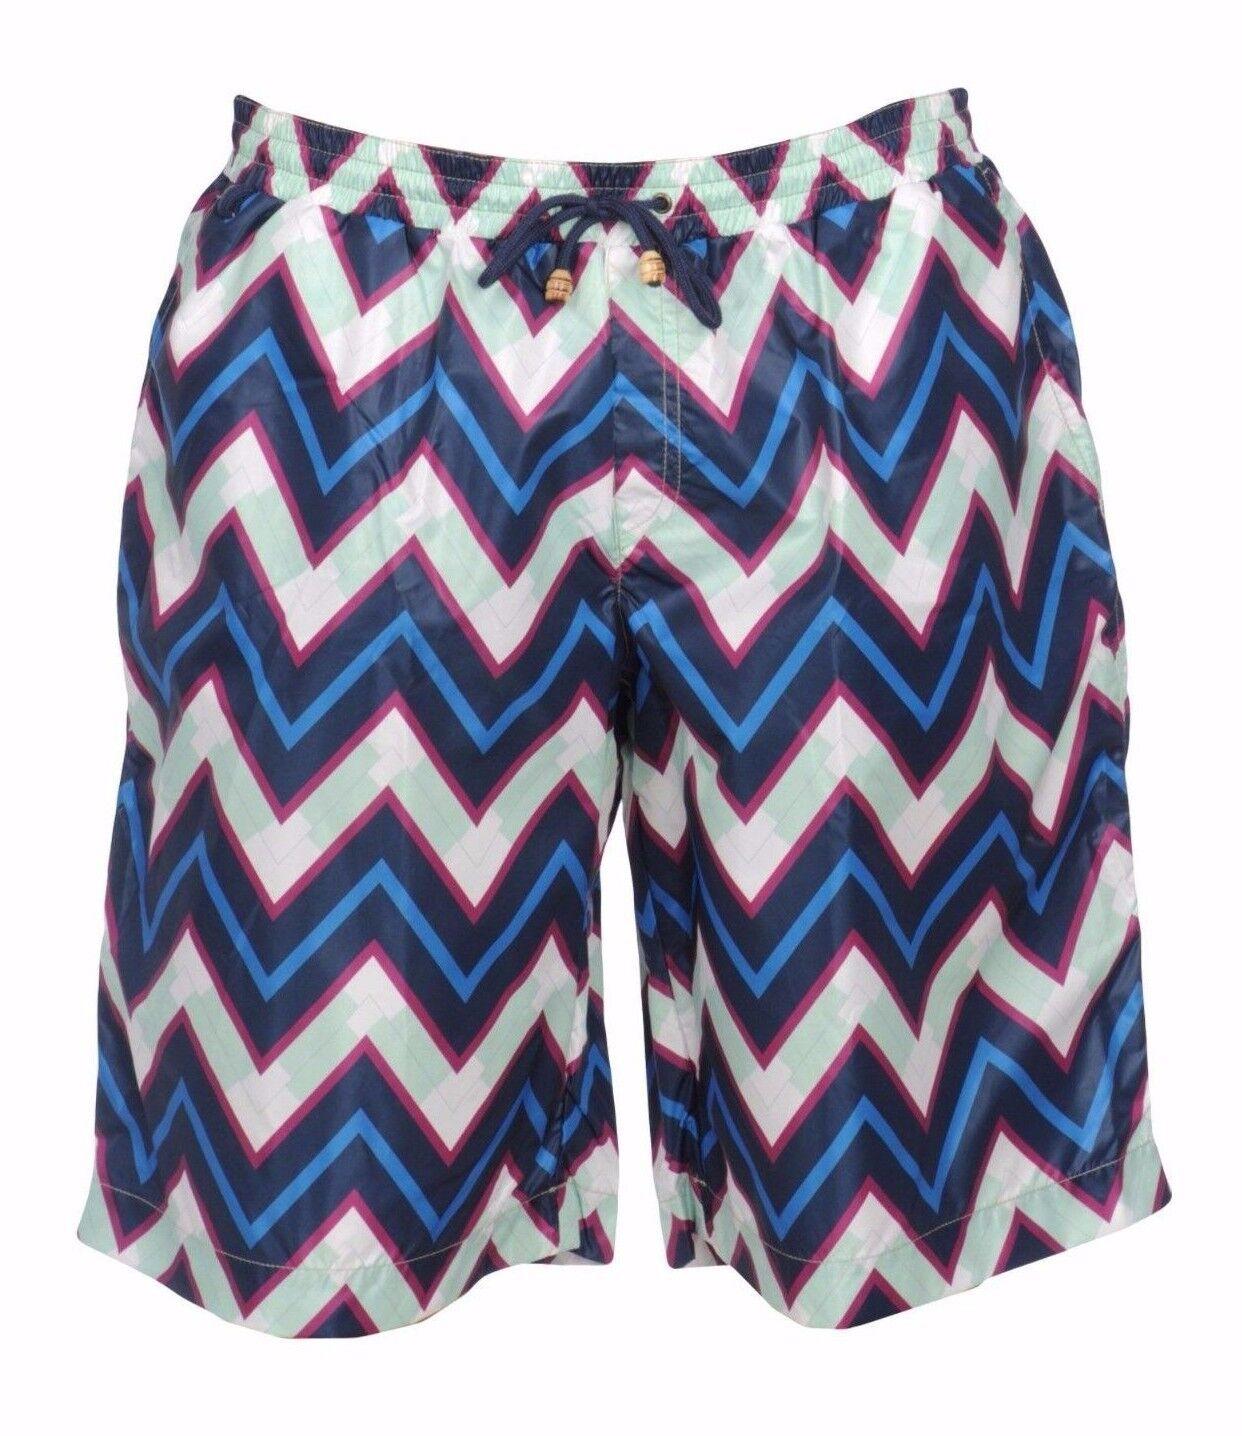 NWT Authentic MISSONI MARE Zigzag Printed Swim TRUNKS Shorts Beachwear XL